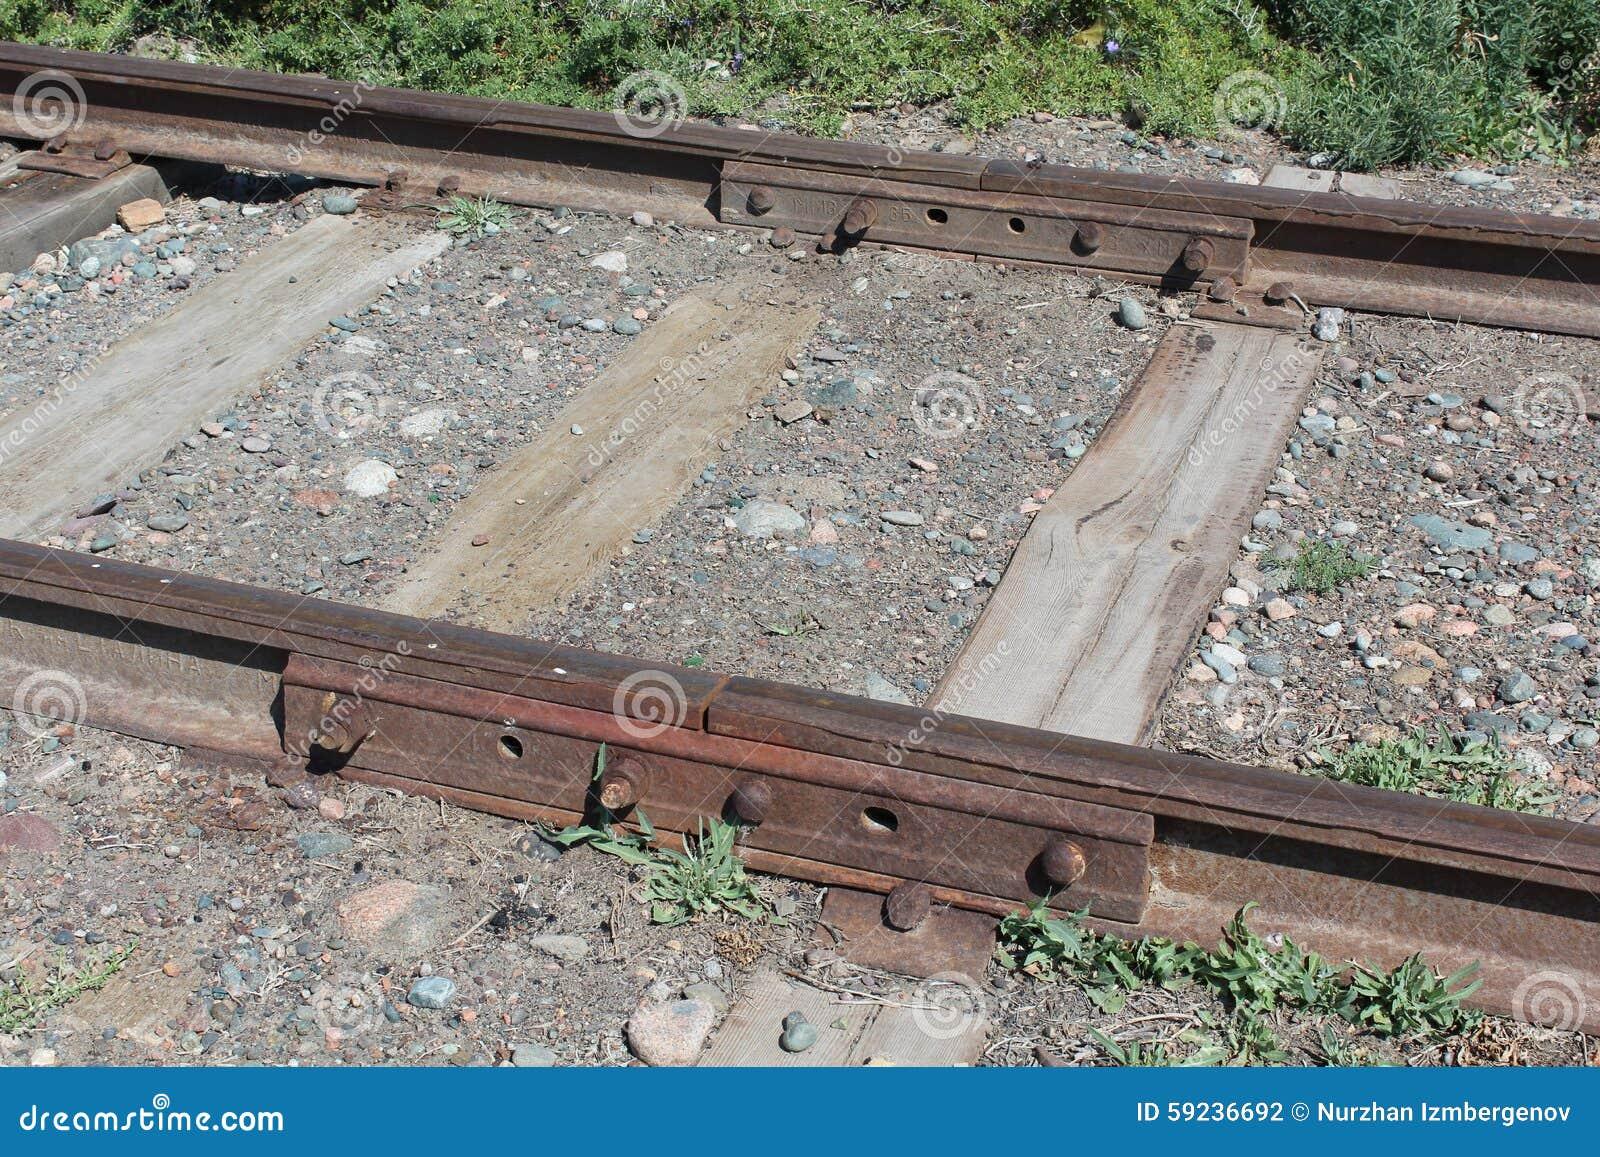 Download Ferrocarril De La Era De Stalin Foto de archivo - Imagen de recorrido, viga: 59236692